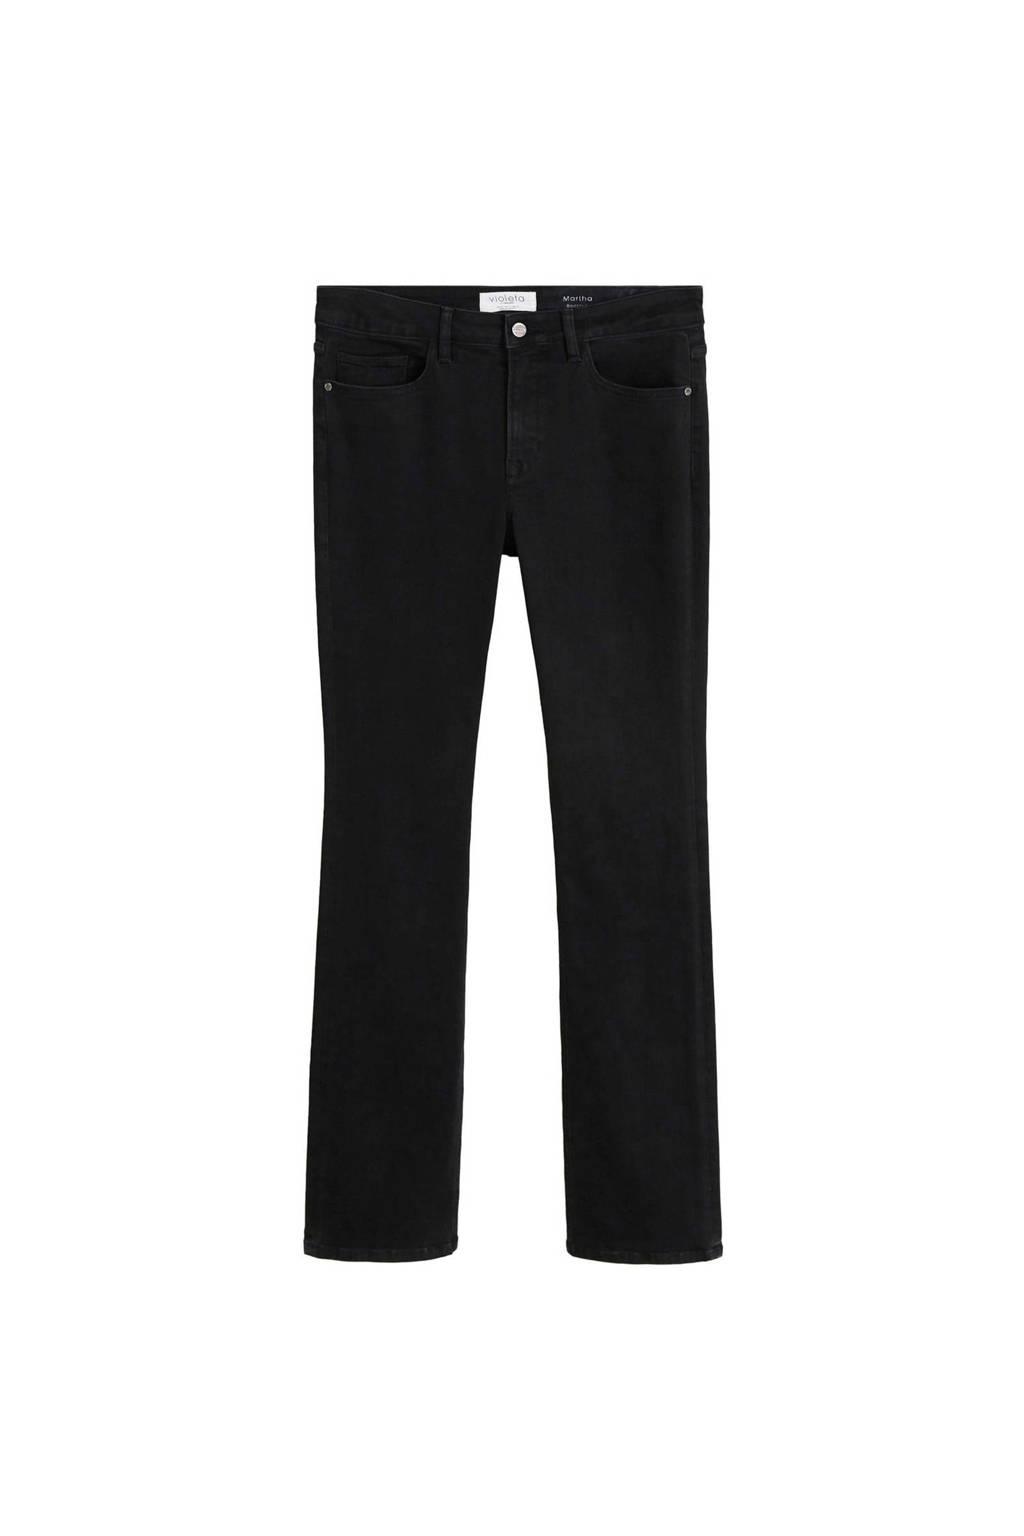 Violeta by Mango pantalon zwart, Zwart